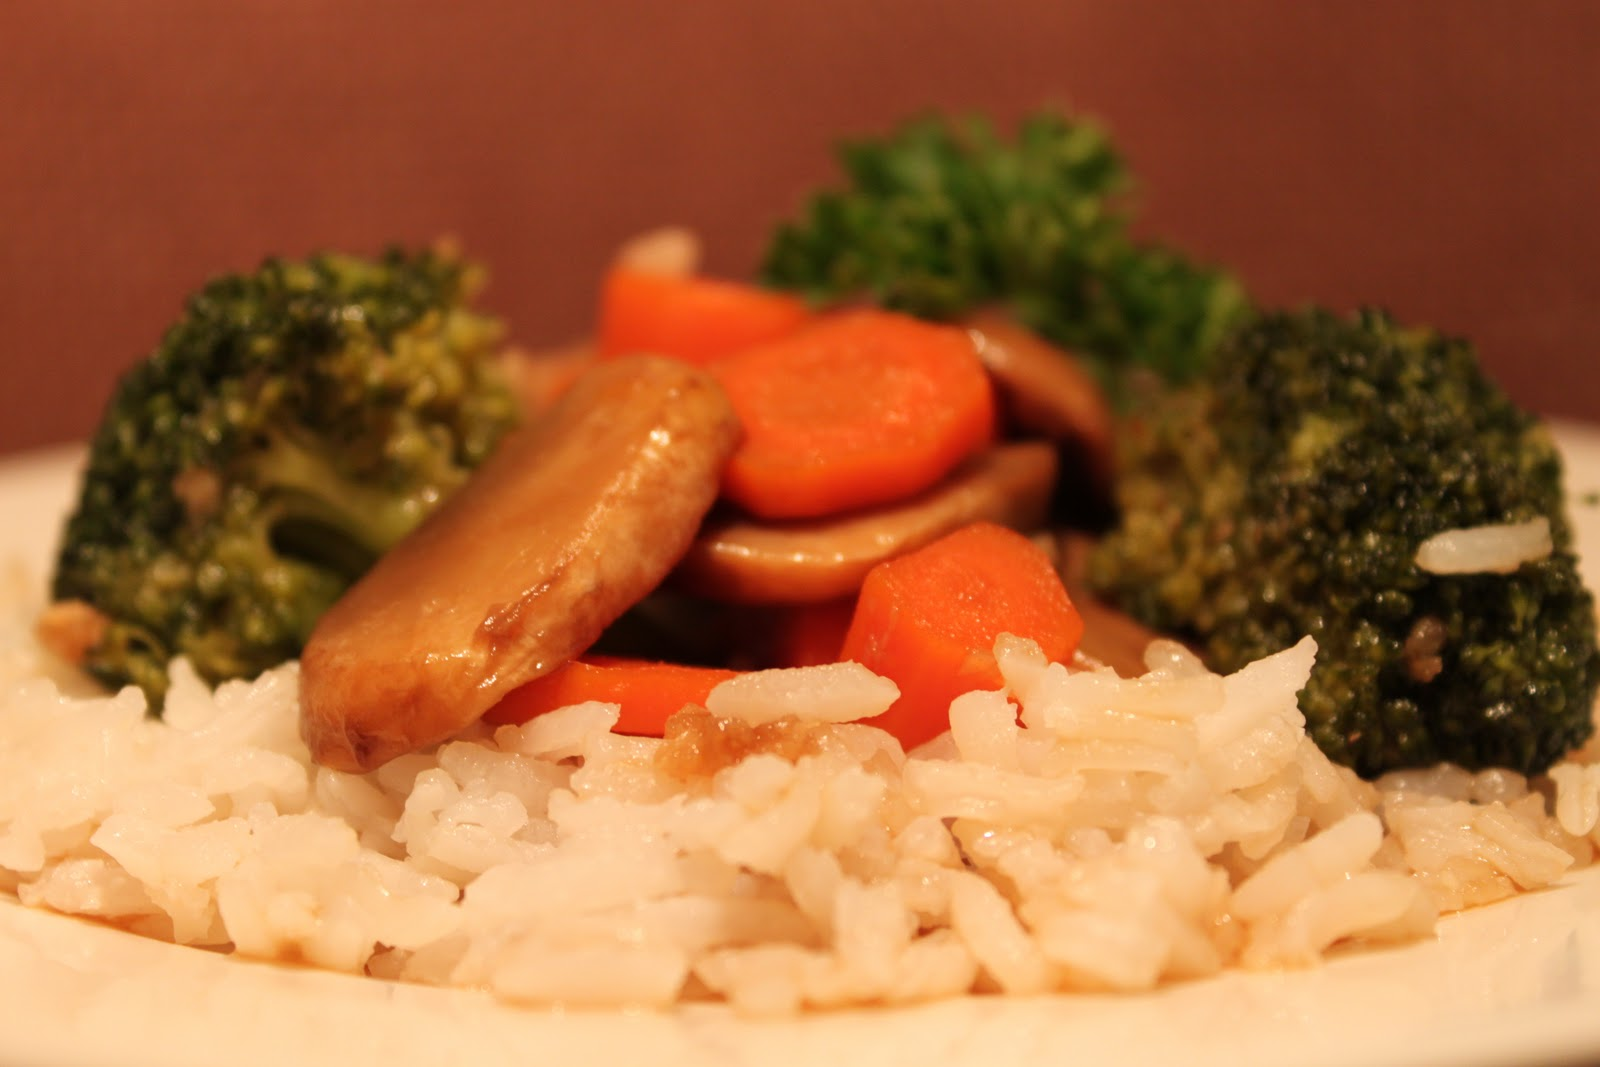 Sauteed Mushrooms, Carrots, and Broccoli in Garlic Sauce | Meatless ...